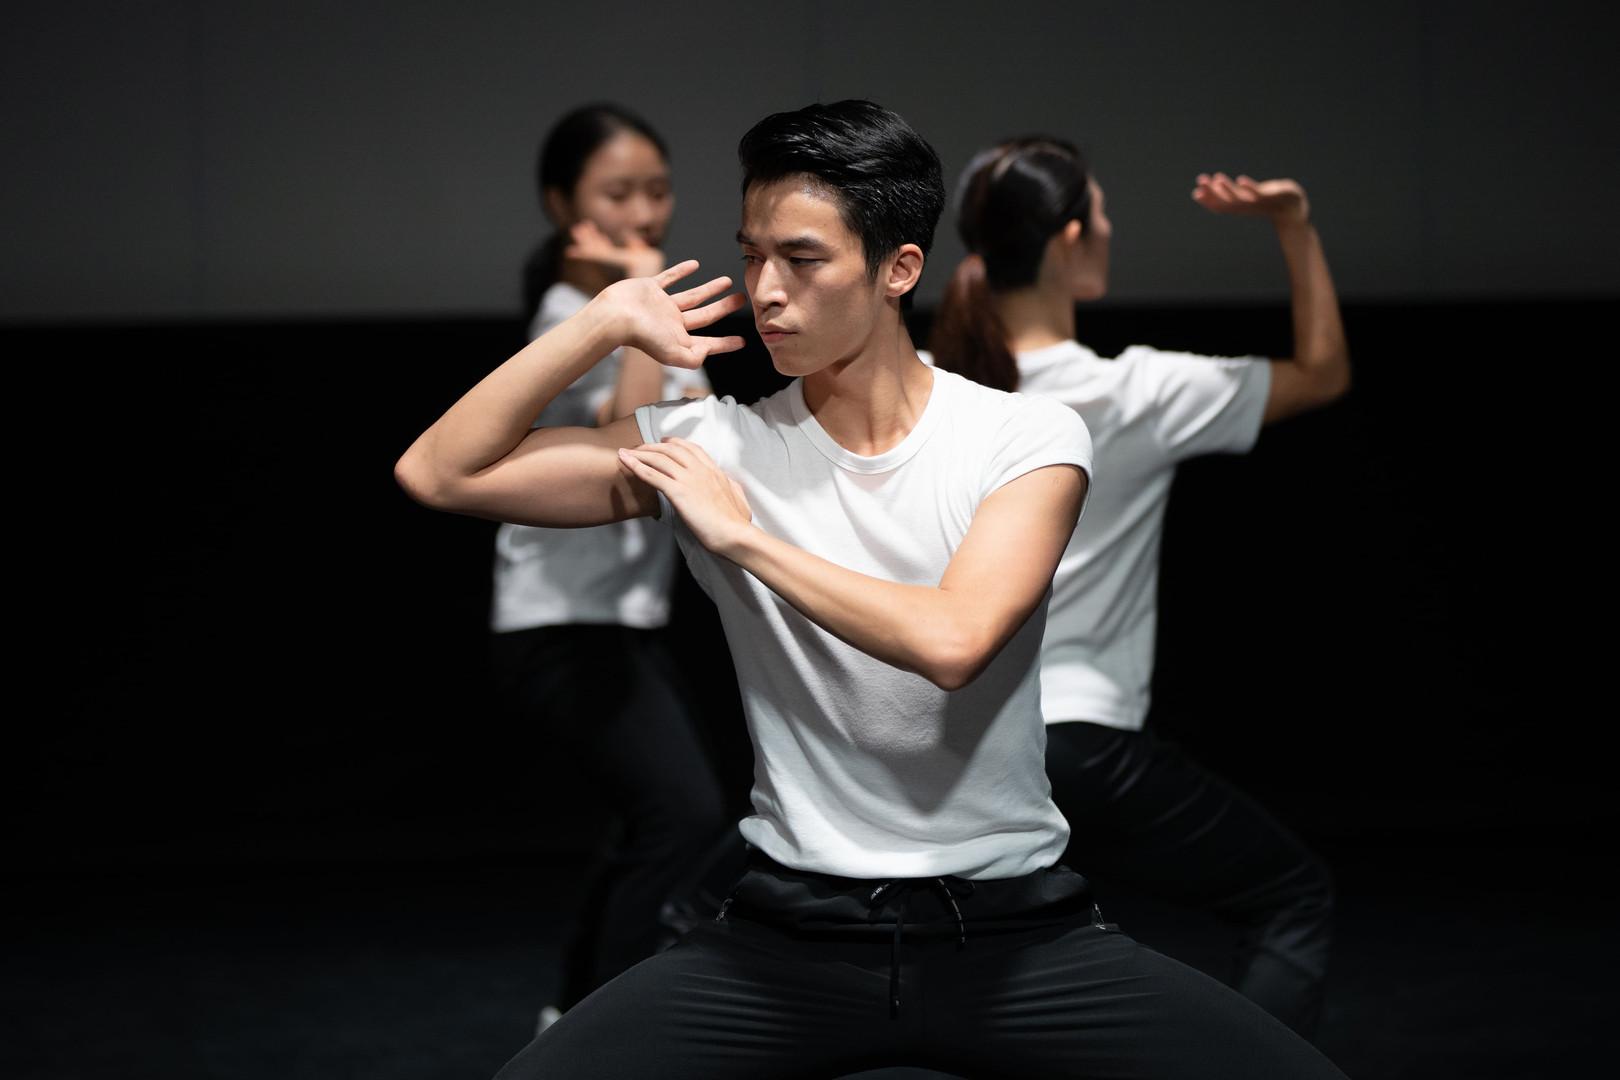 "侯敘臣 Hou Xuchen  舞蹈員 Dancer  2013年畢業於廣州市藝術學校中國舞系,同年獲全額獎學金入讀香港演藝學院,主修中國舞,多次代表學院赴海外交流表演,曾到訪加拿大,德國,韓國等地,並獲香港演藝學院舞蹈學院院長獎學金及徐美琪傑出表演藝術家獎。  2017年於香港演藝學院畢業後,隨即加入香港舞蹈團,演出包括:《白蛇》、《三城誌》〈四季〉、《踏歌行》、《鬍鬚爺爺之詩遊記》獨舞演繹李白、《劉三姐》、《絲路如詩》雙人舞〈掀起你的蓋頭來〉、「八樓平台」《Neon》及《境》、《一水南天》飾陳立梅,並為「中國舞蹈與中國武術之交互研究與成果呈現」計劃之研究員之一。  Graduated from the Chinese Dance Department of Guangzhou Art School in 2013, Hou Xuchen was awarded full scholarship to study at the Hong Kong Academy for Performing Arts (HKAPA) in the same year, majoring in Chinese Dance. Hou represented the Academy on numerous overseas performance tours, visiting Canada, Germany and Korea, etc. He was awarded HKAPA's Dean of Dance Scholarship as well as The Margaret Zee Outstanding Performer Award.  After graduating from the HKAPA in 2017, Hou joined the Hong Kong Dance Company and has since performed in various productions including Lady White of West Lake, Four Seasons in Tale of Three Cities, Dream of the Past: Ancient Chinese Court Dances, solo in Fun Ride with Big Beard – Dancing Poems, Liu San Jie, pas de deux in Ode to the Silk Road, ""8/F Platform""– Neon and Jing, and A Tale of the Southern Sky. He is also a researcher of HKDC's Research study on Chinese martial arts and Chinese dance."